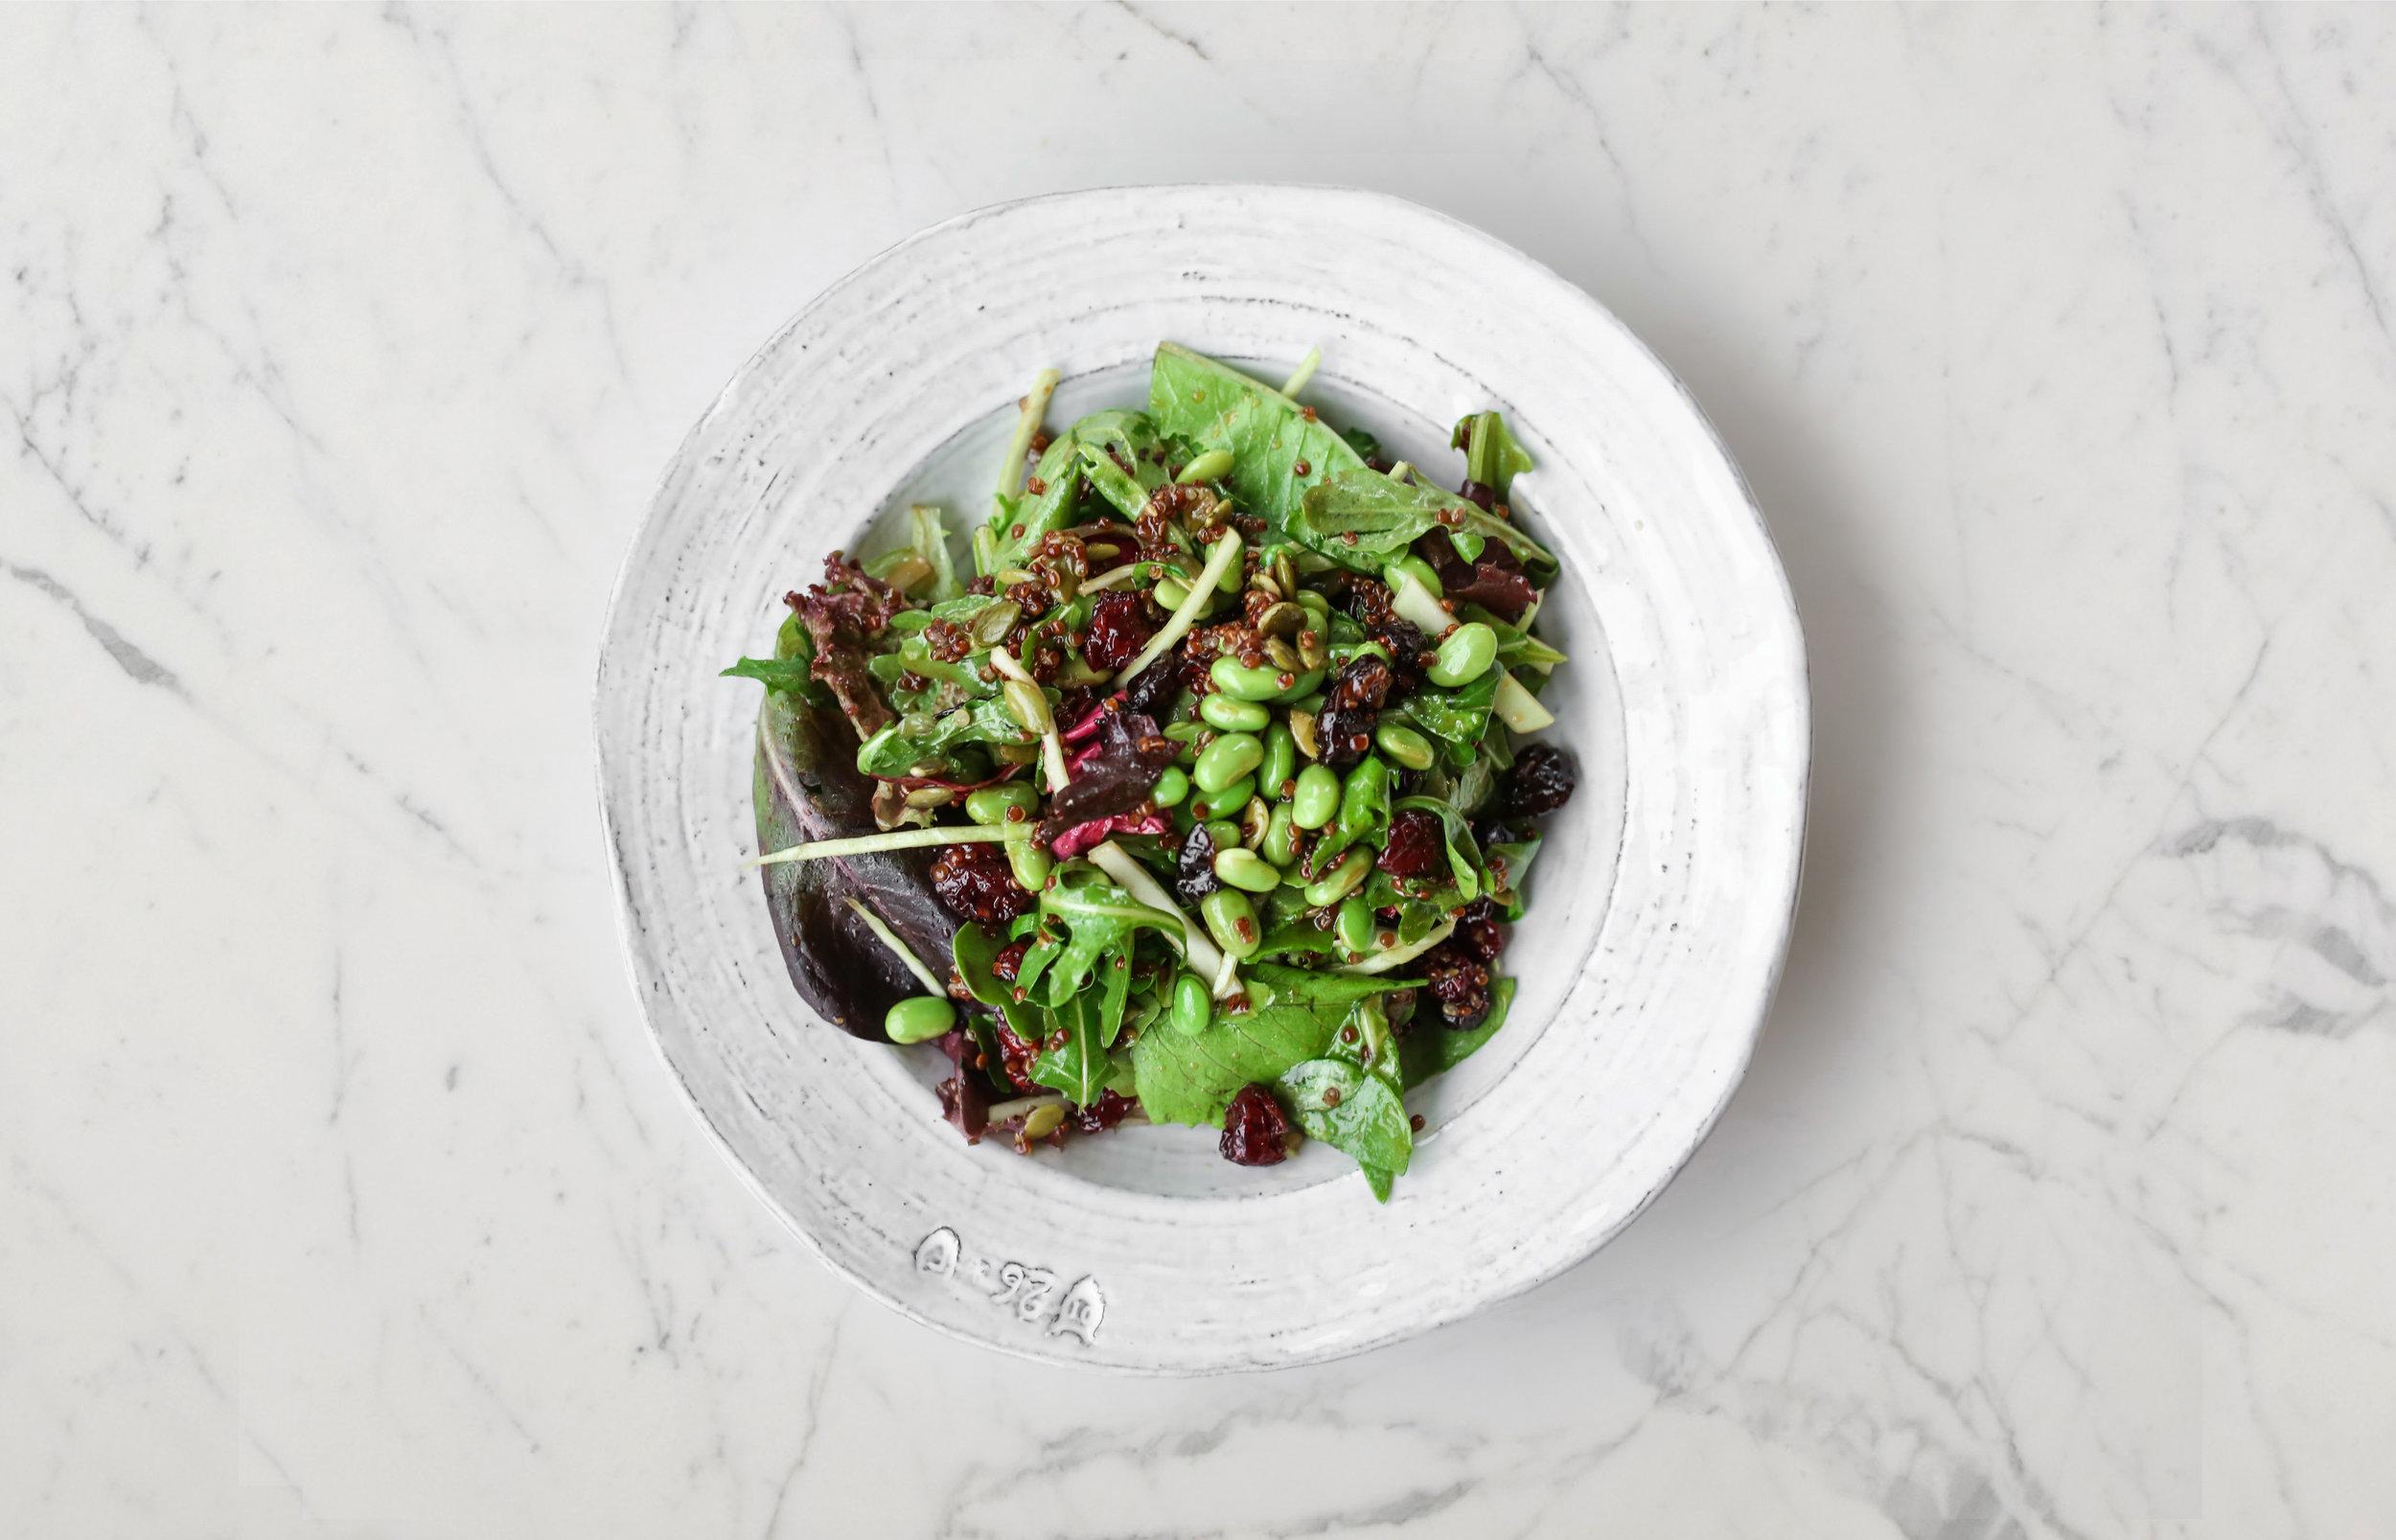 laucole-website-2016-october-recipes-salad-header-asianedamamesalad-3.jpg